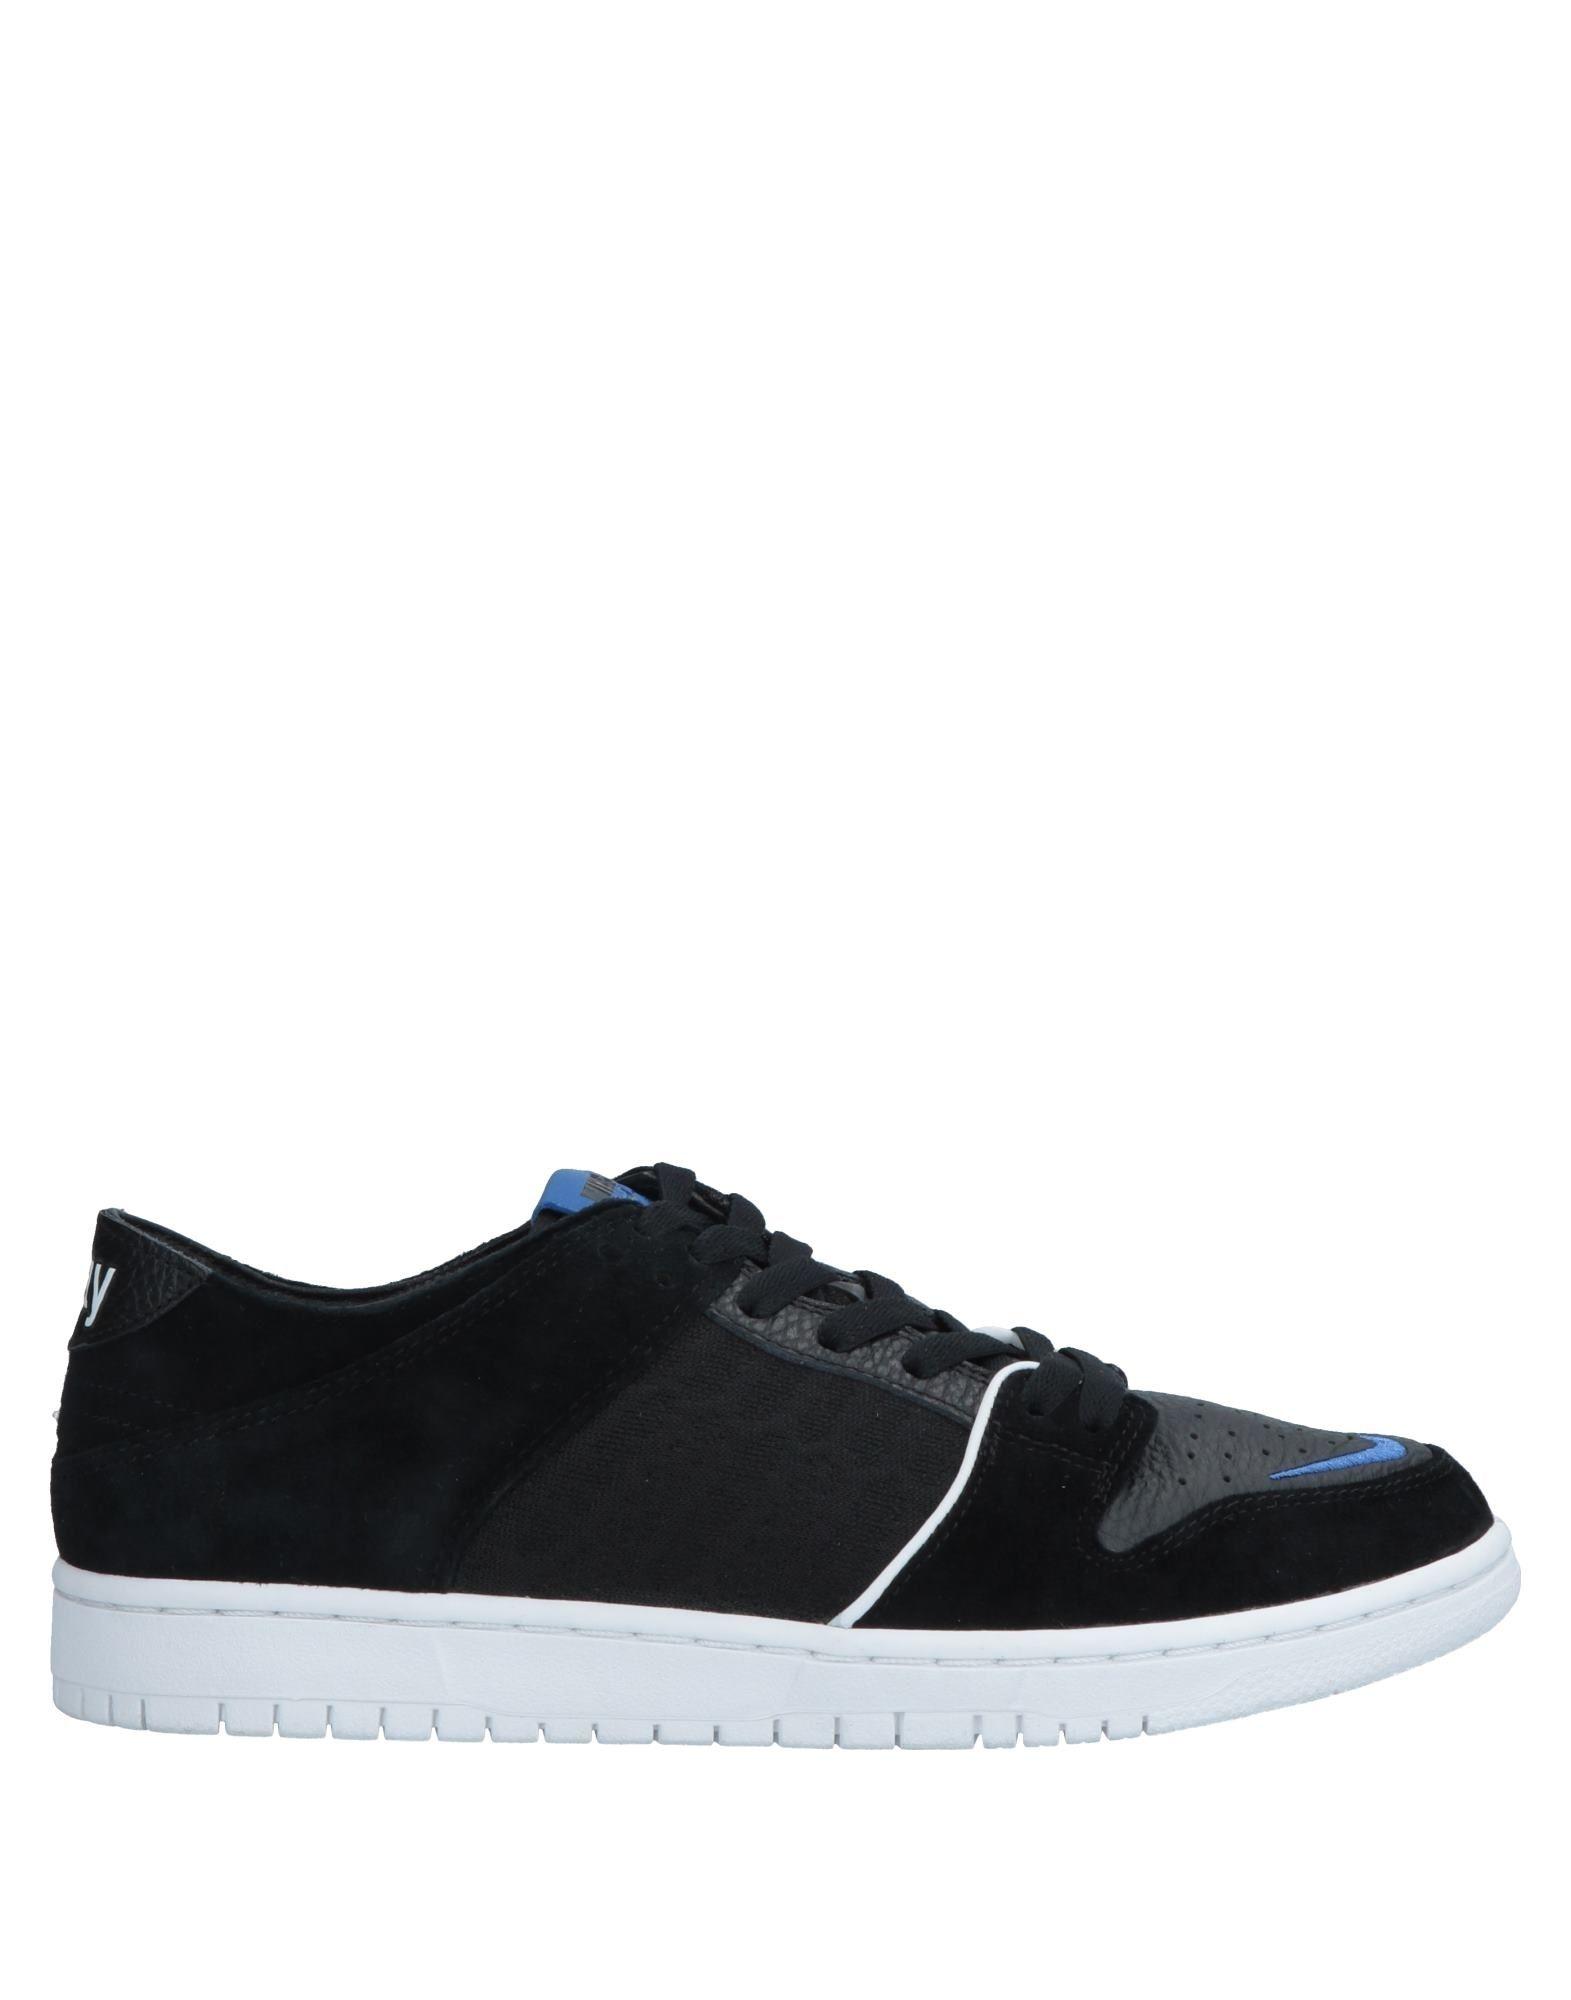 Turnschuhe Nike Sb Collection herren - 11689744QL